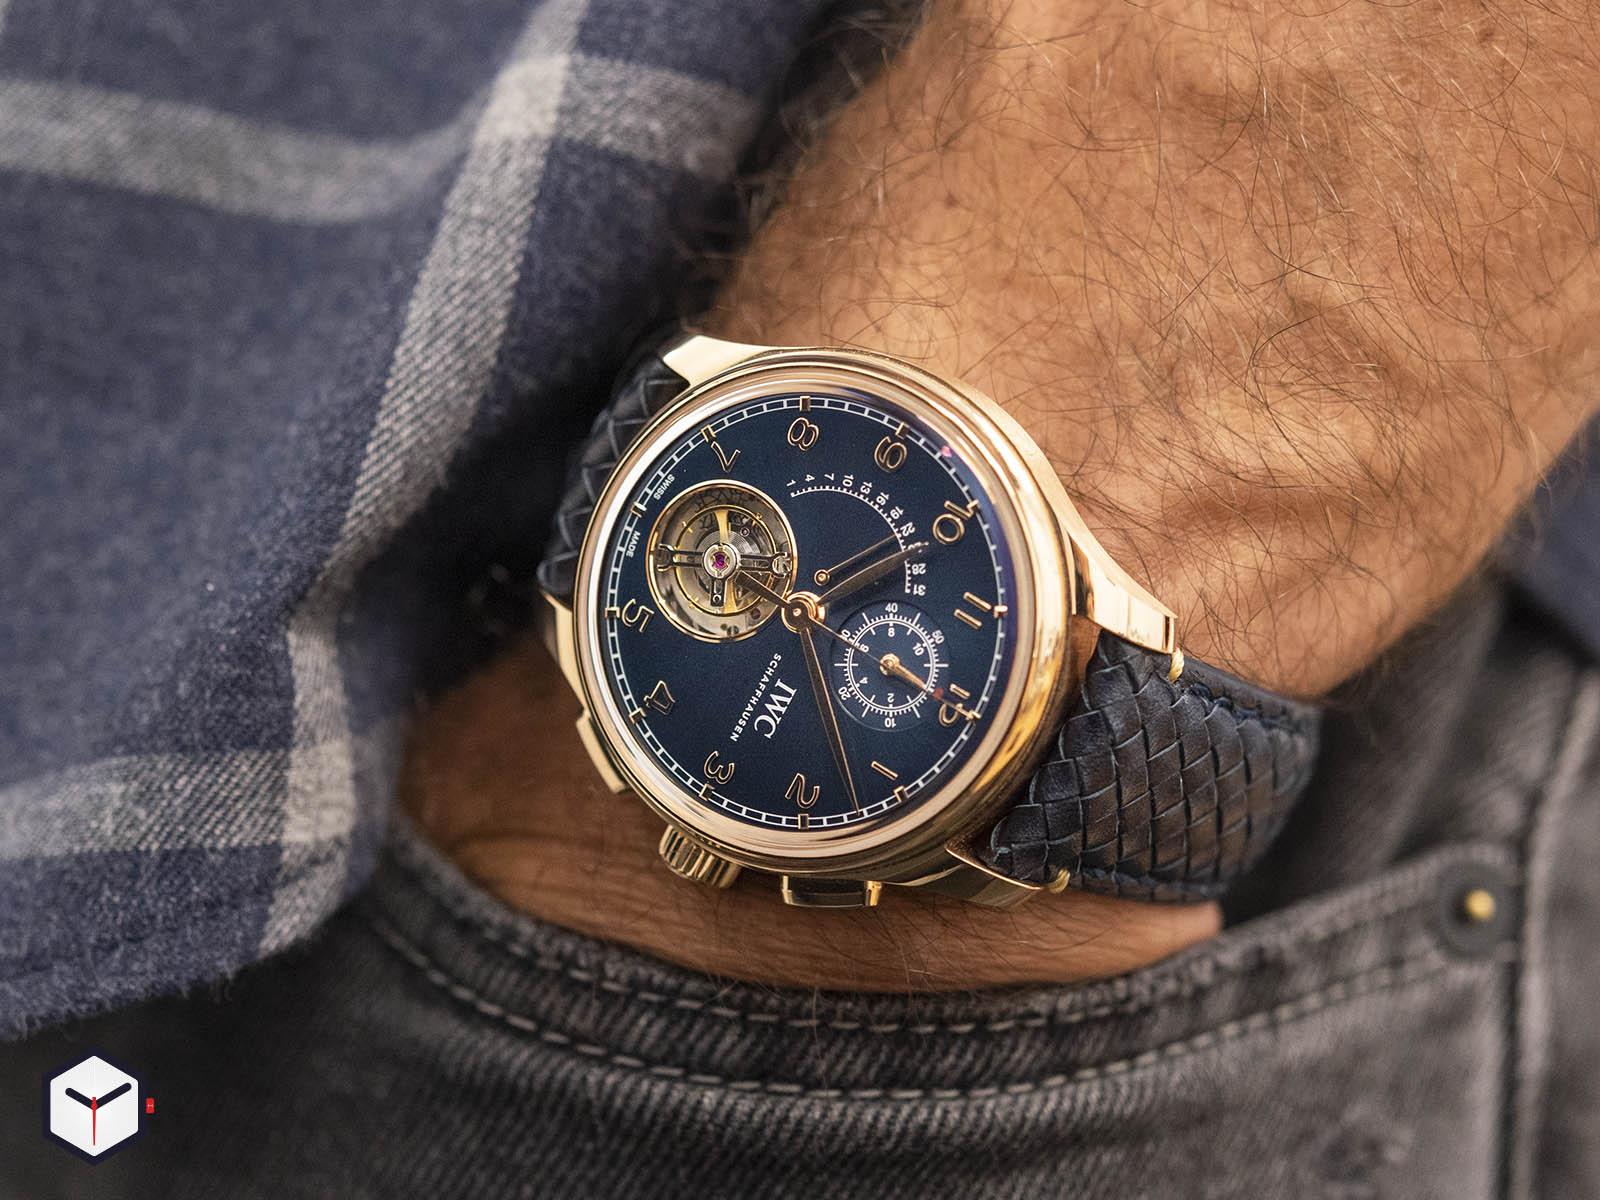 iw394005-iwc-portugieser-tourbillon-retrograde-chronograph-boutique-edition-9.jpg